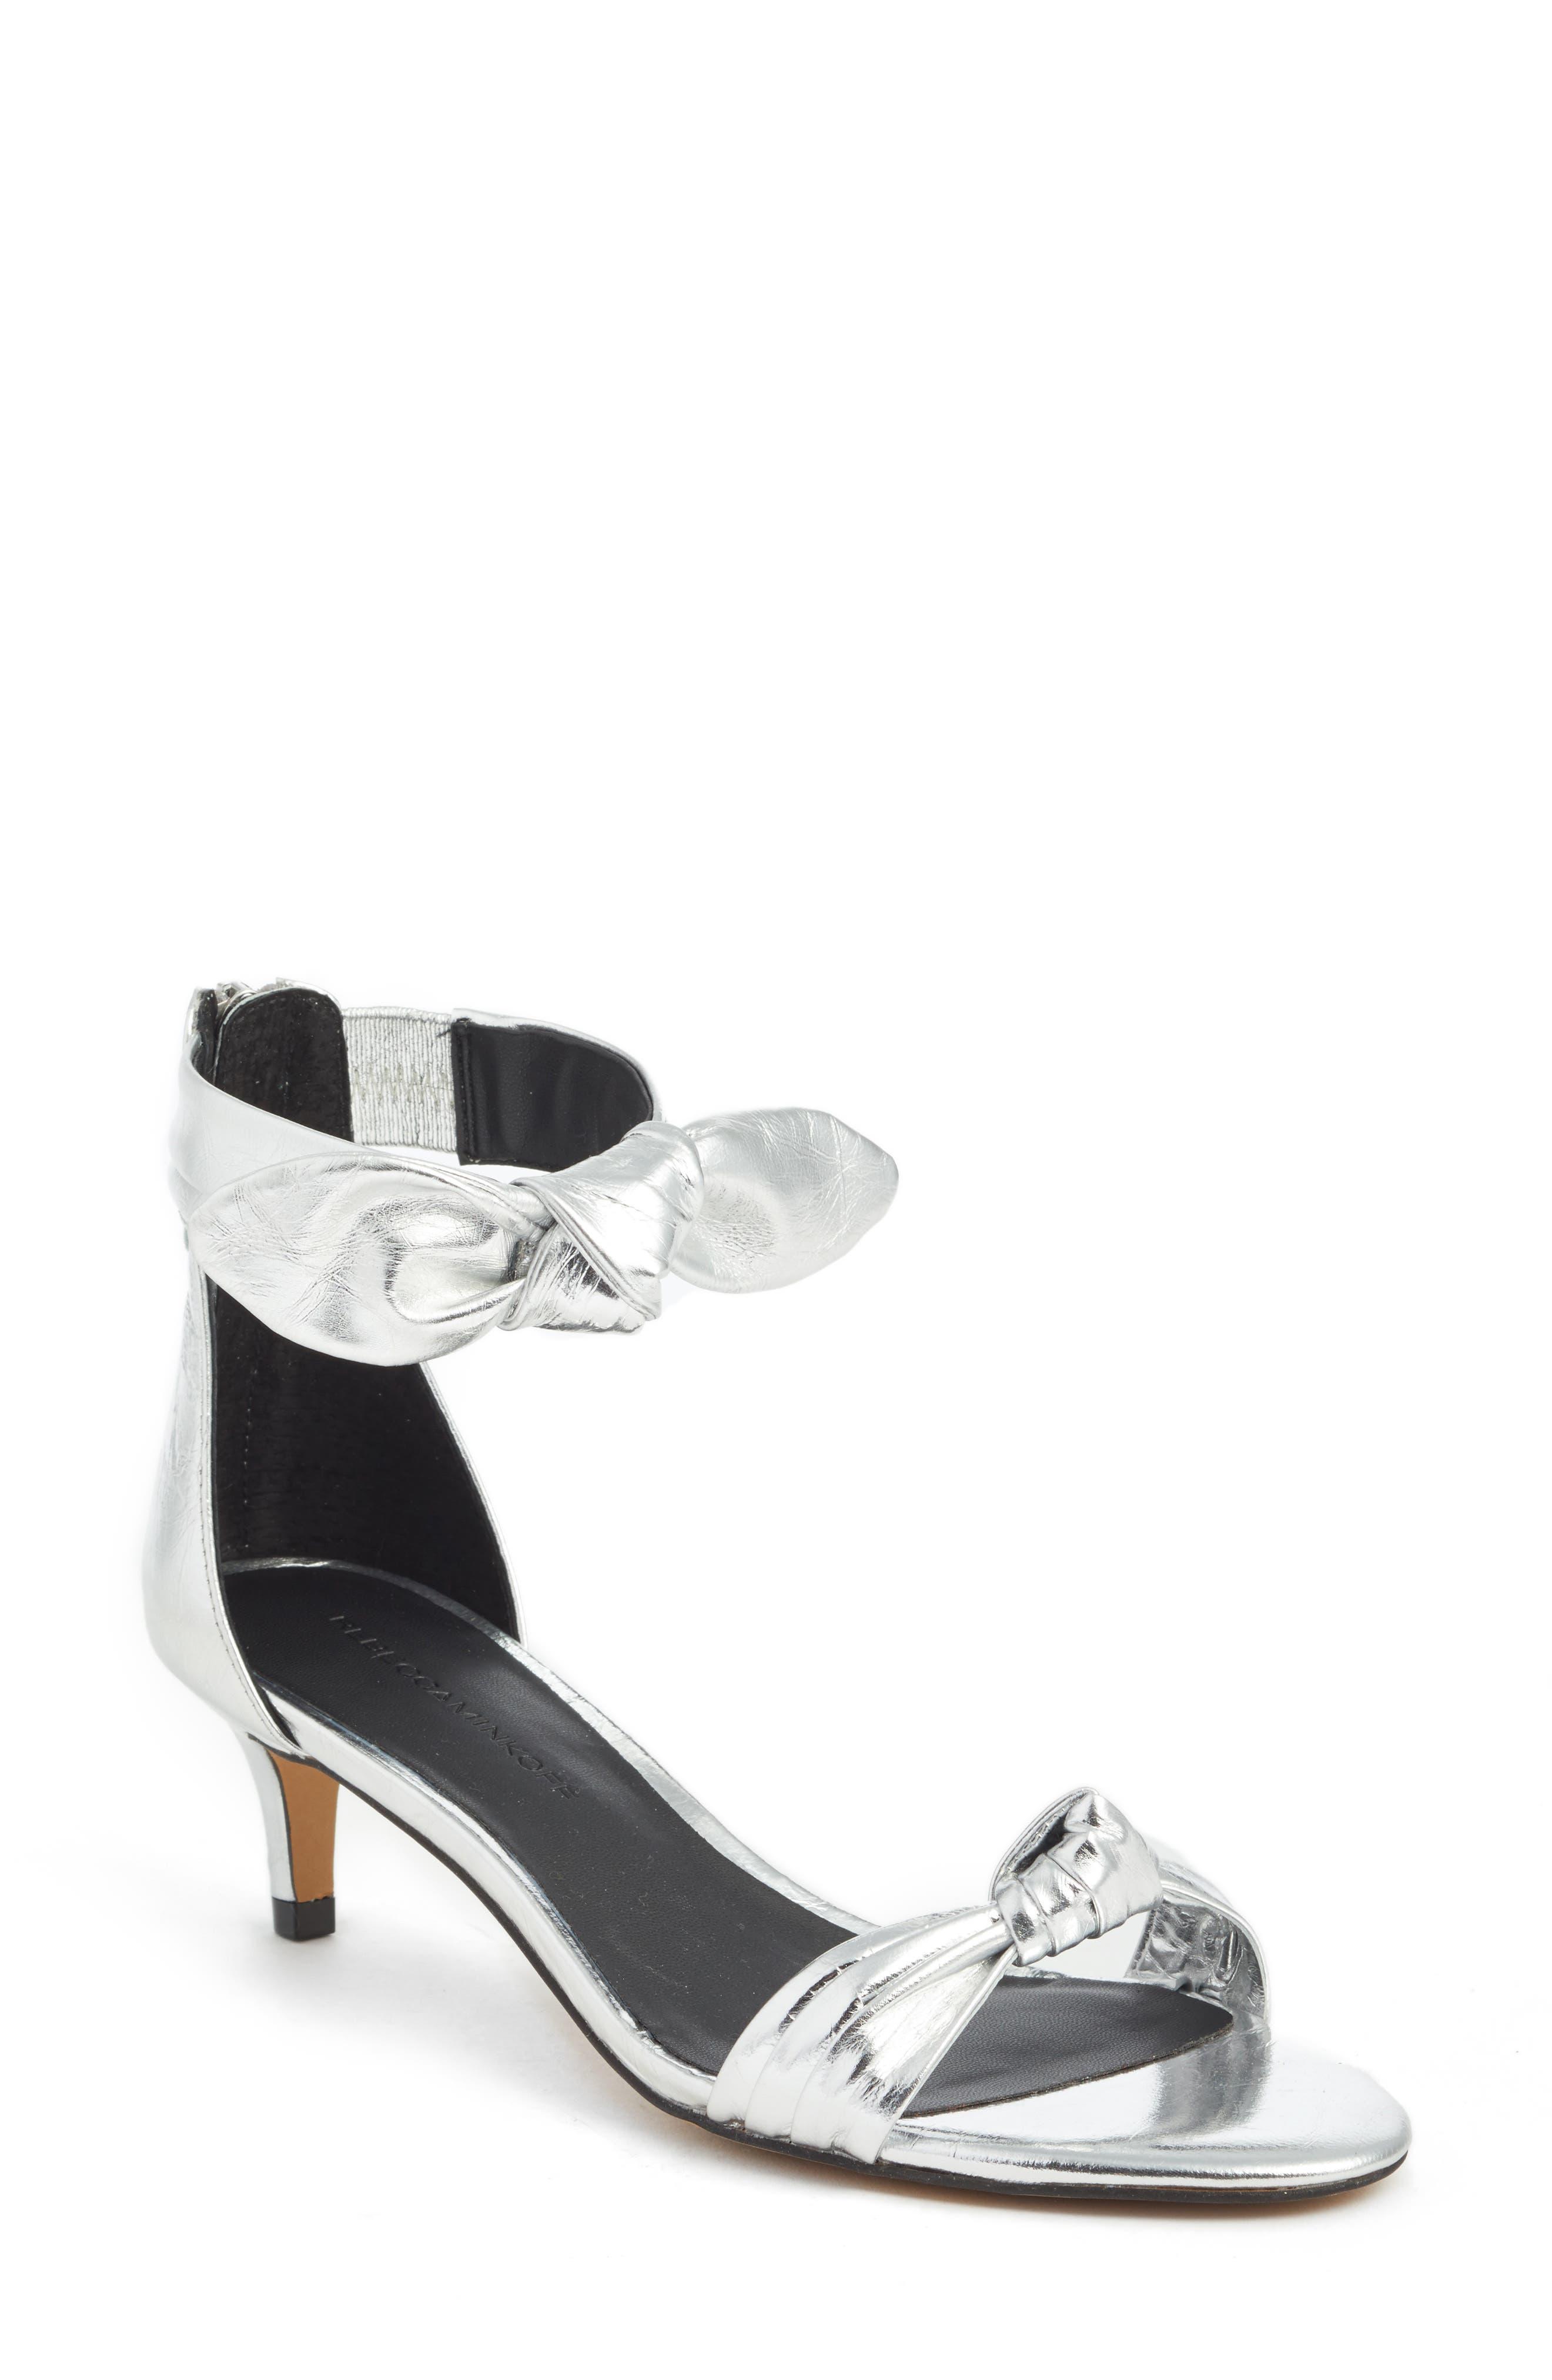 Kaley Knotted Kitten Heel Sandal,                             Main thumbnail 1, color,                             Silver Metallic Leather